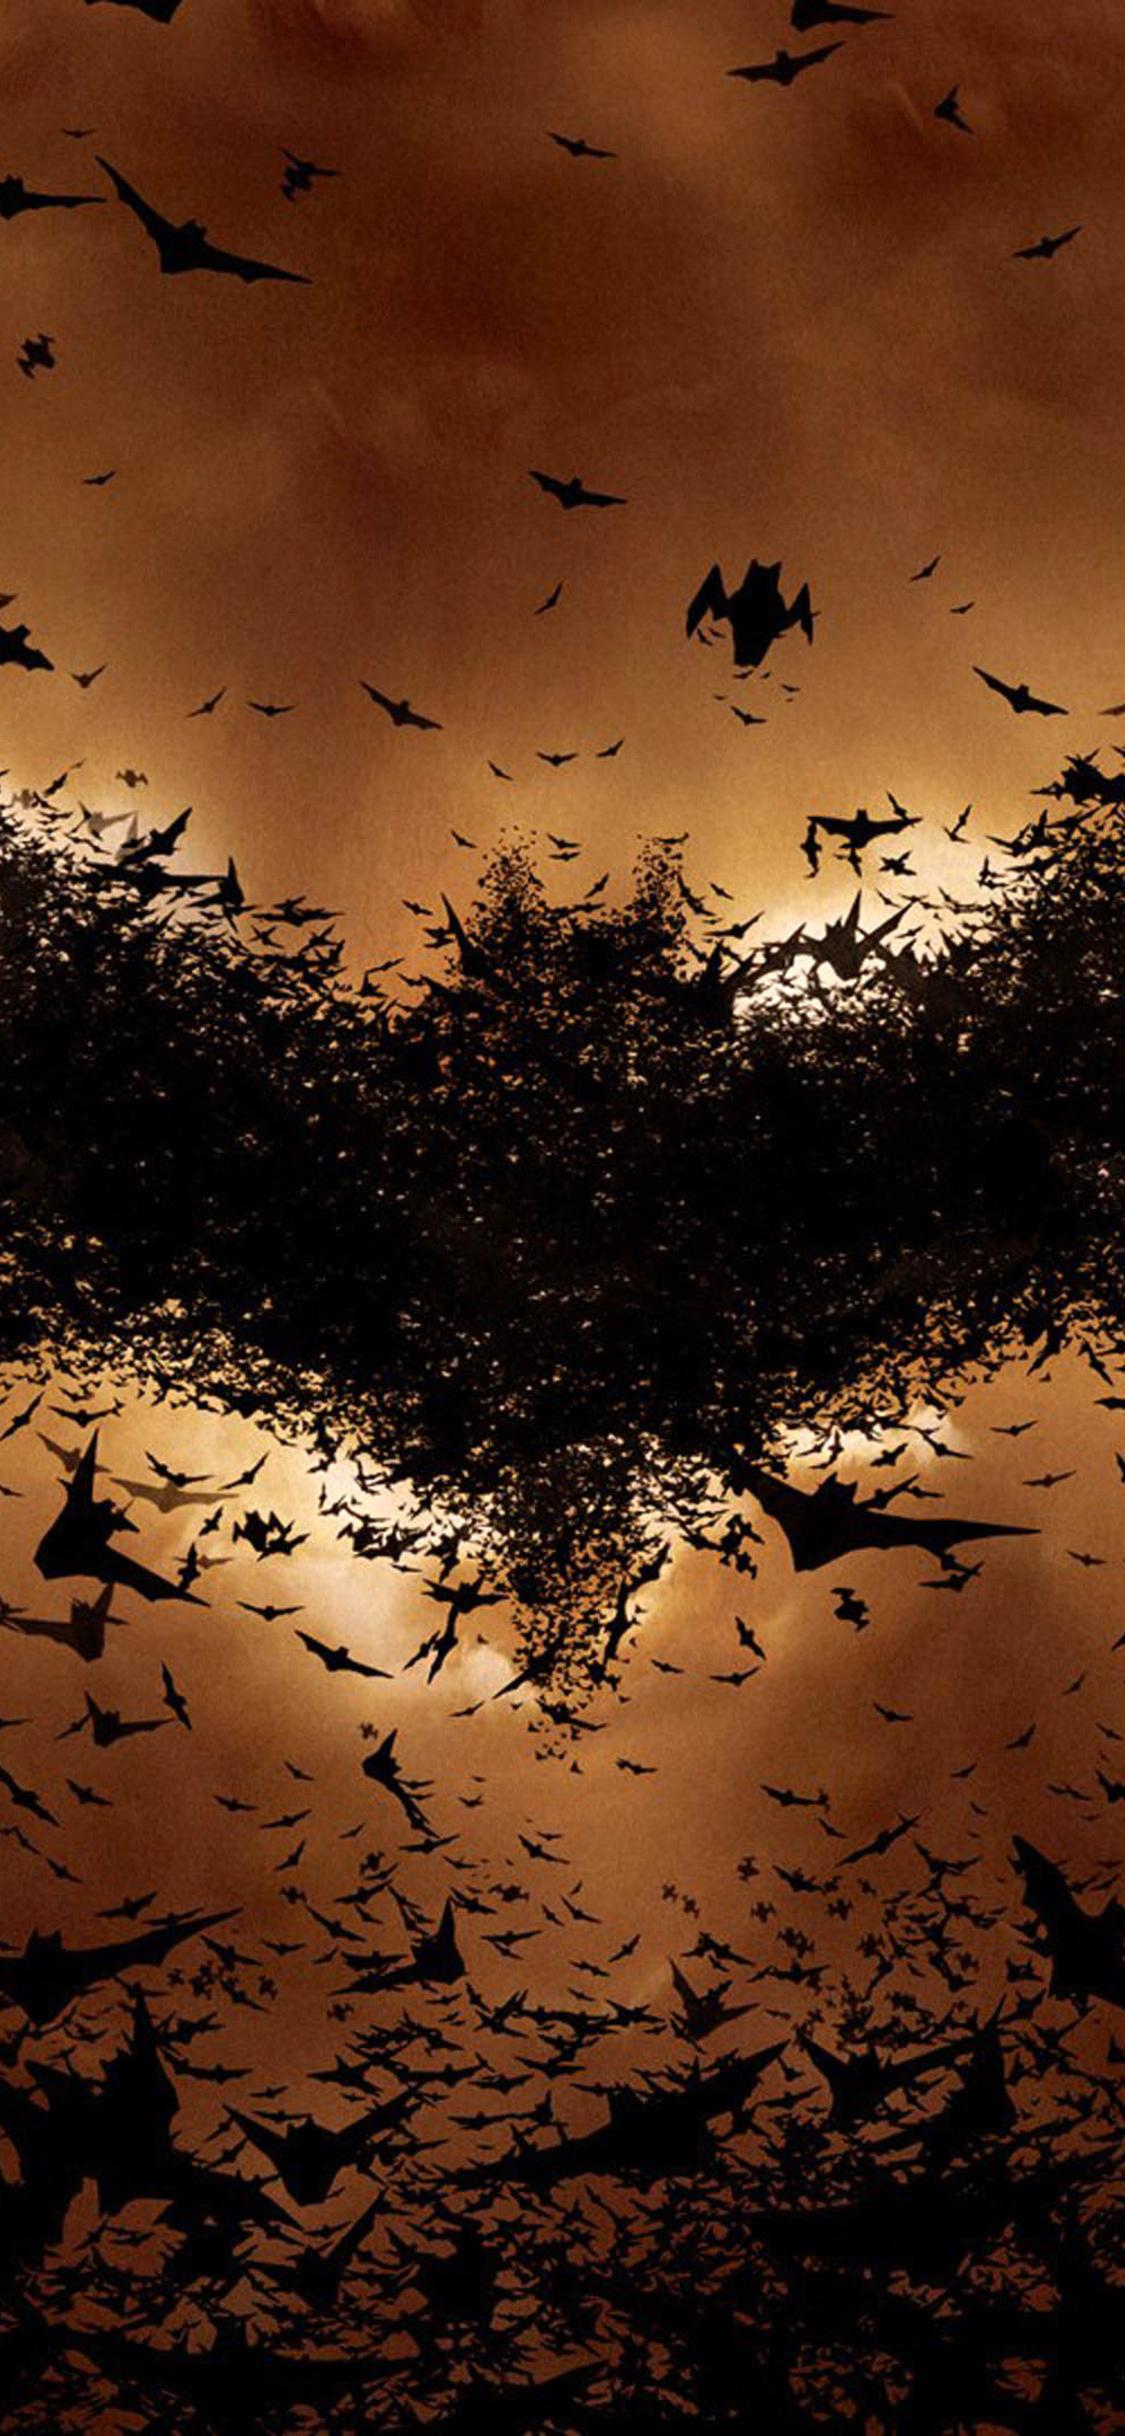 batman-begins-bat-symbol-cy.jpg